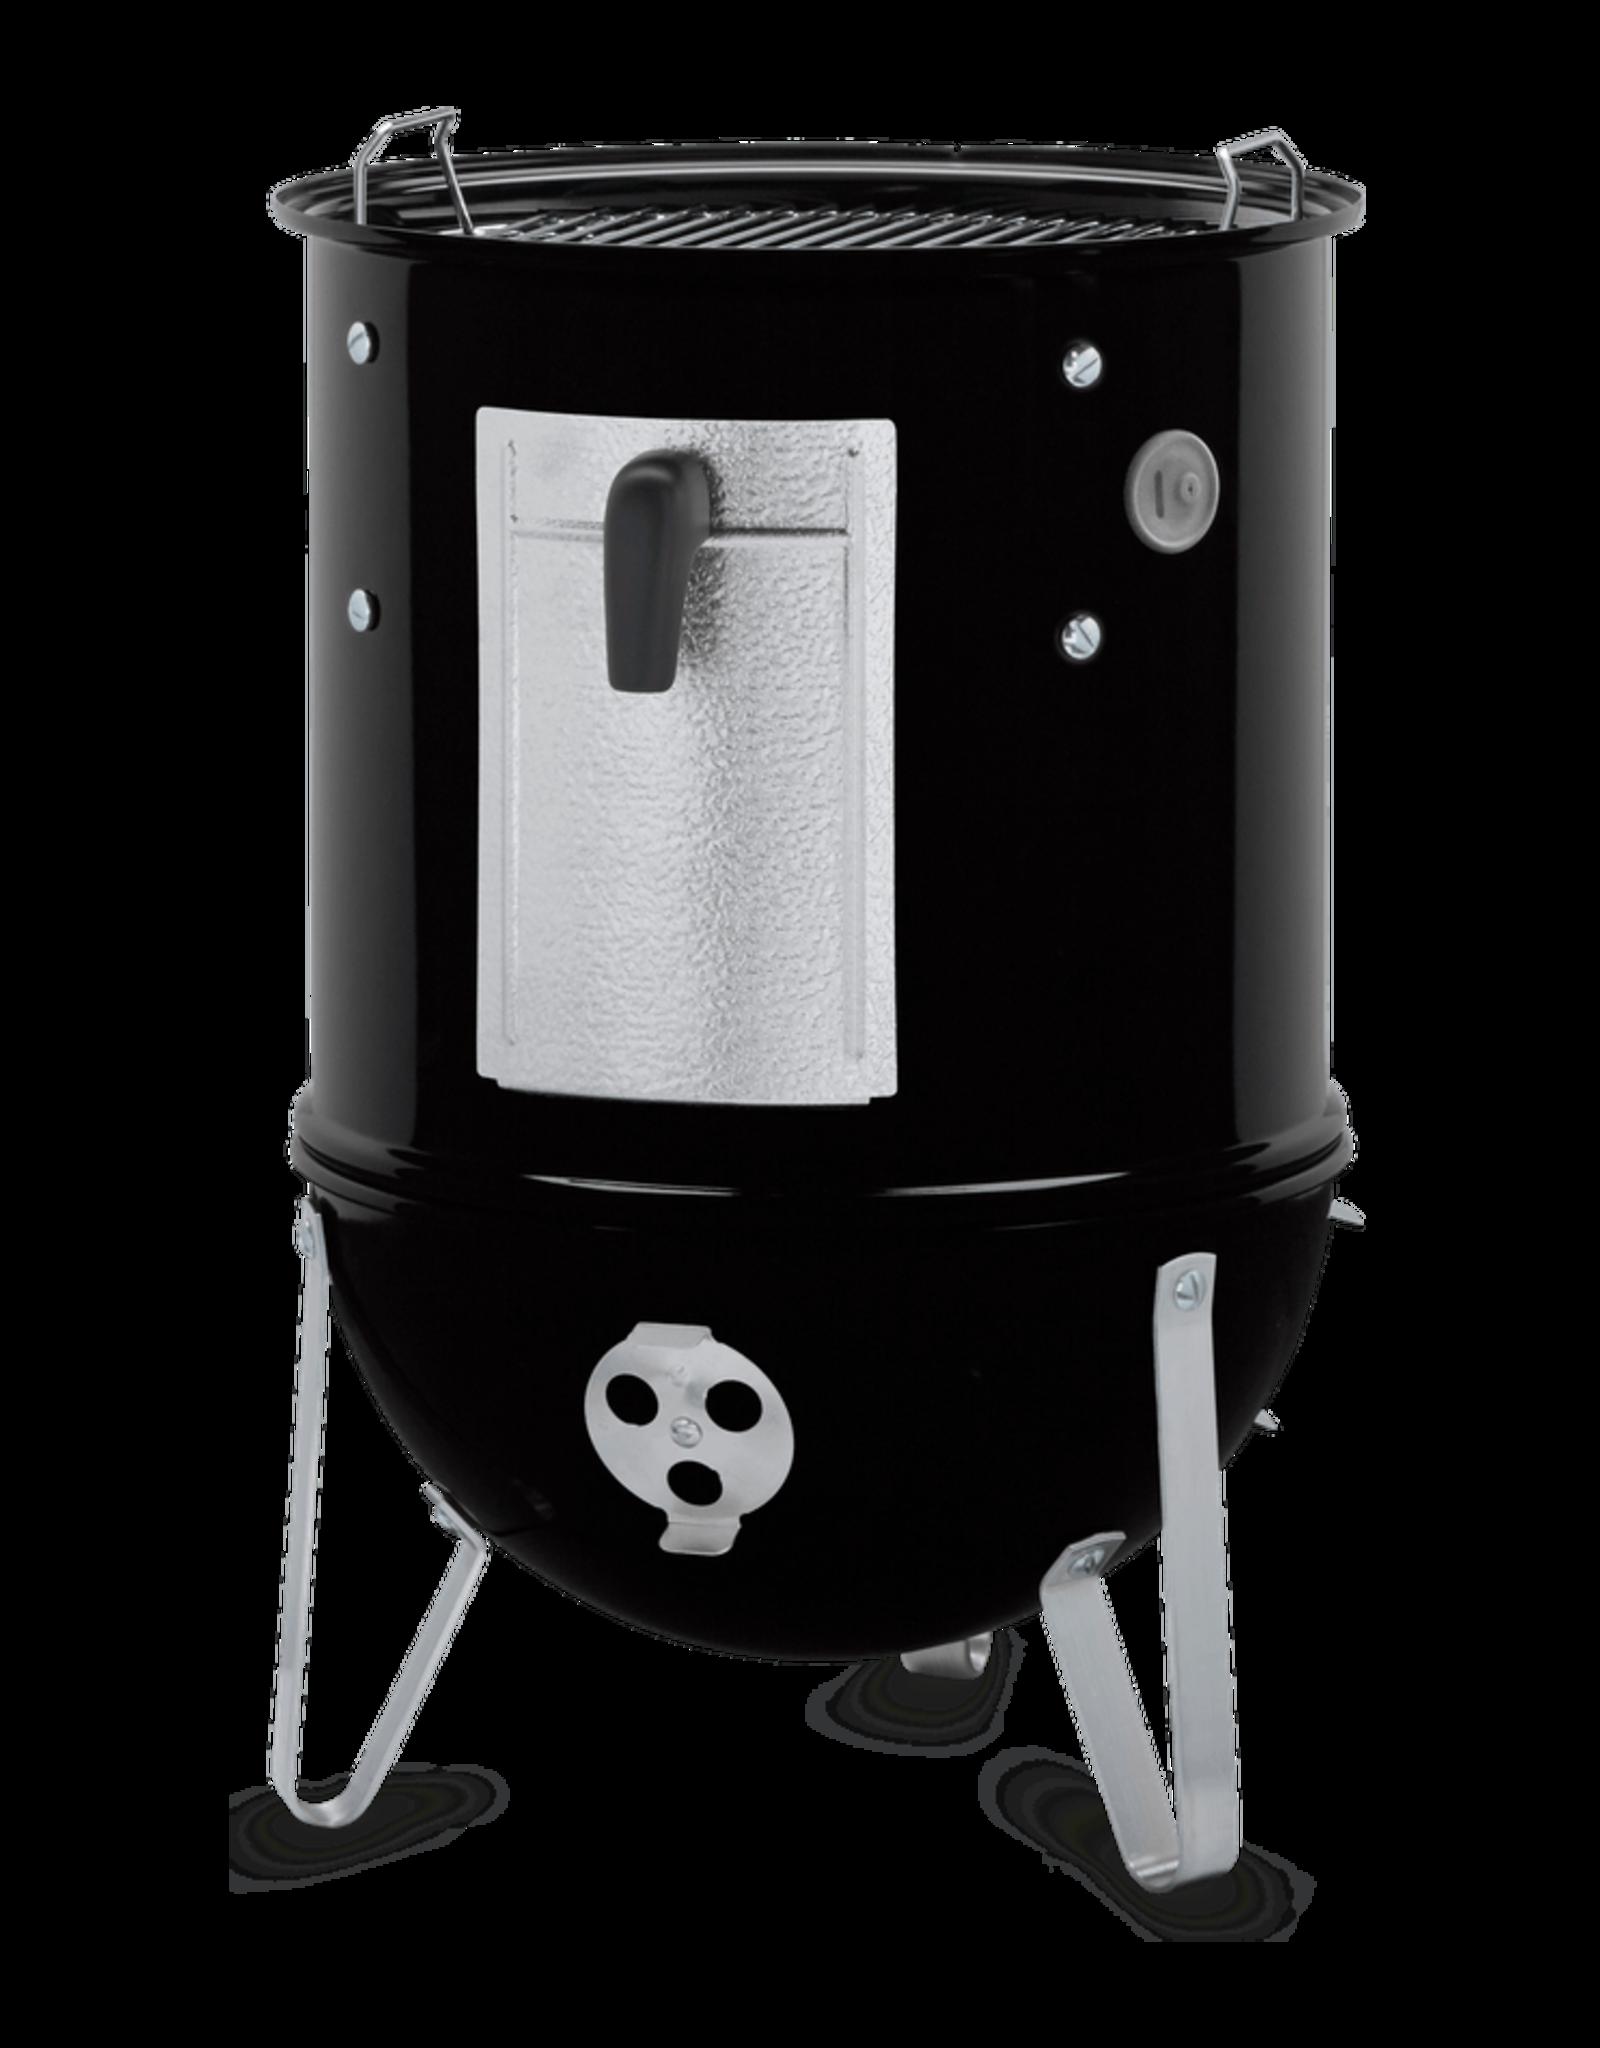 Weber Smokey Mountain Cooker 14'' Smoker Black 711001